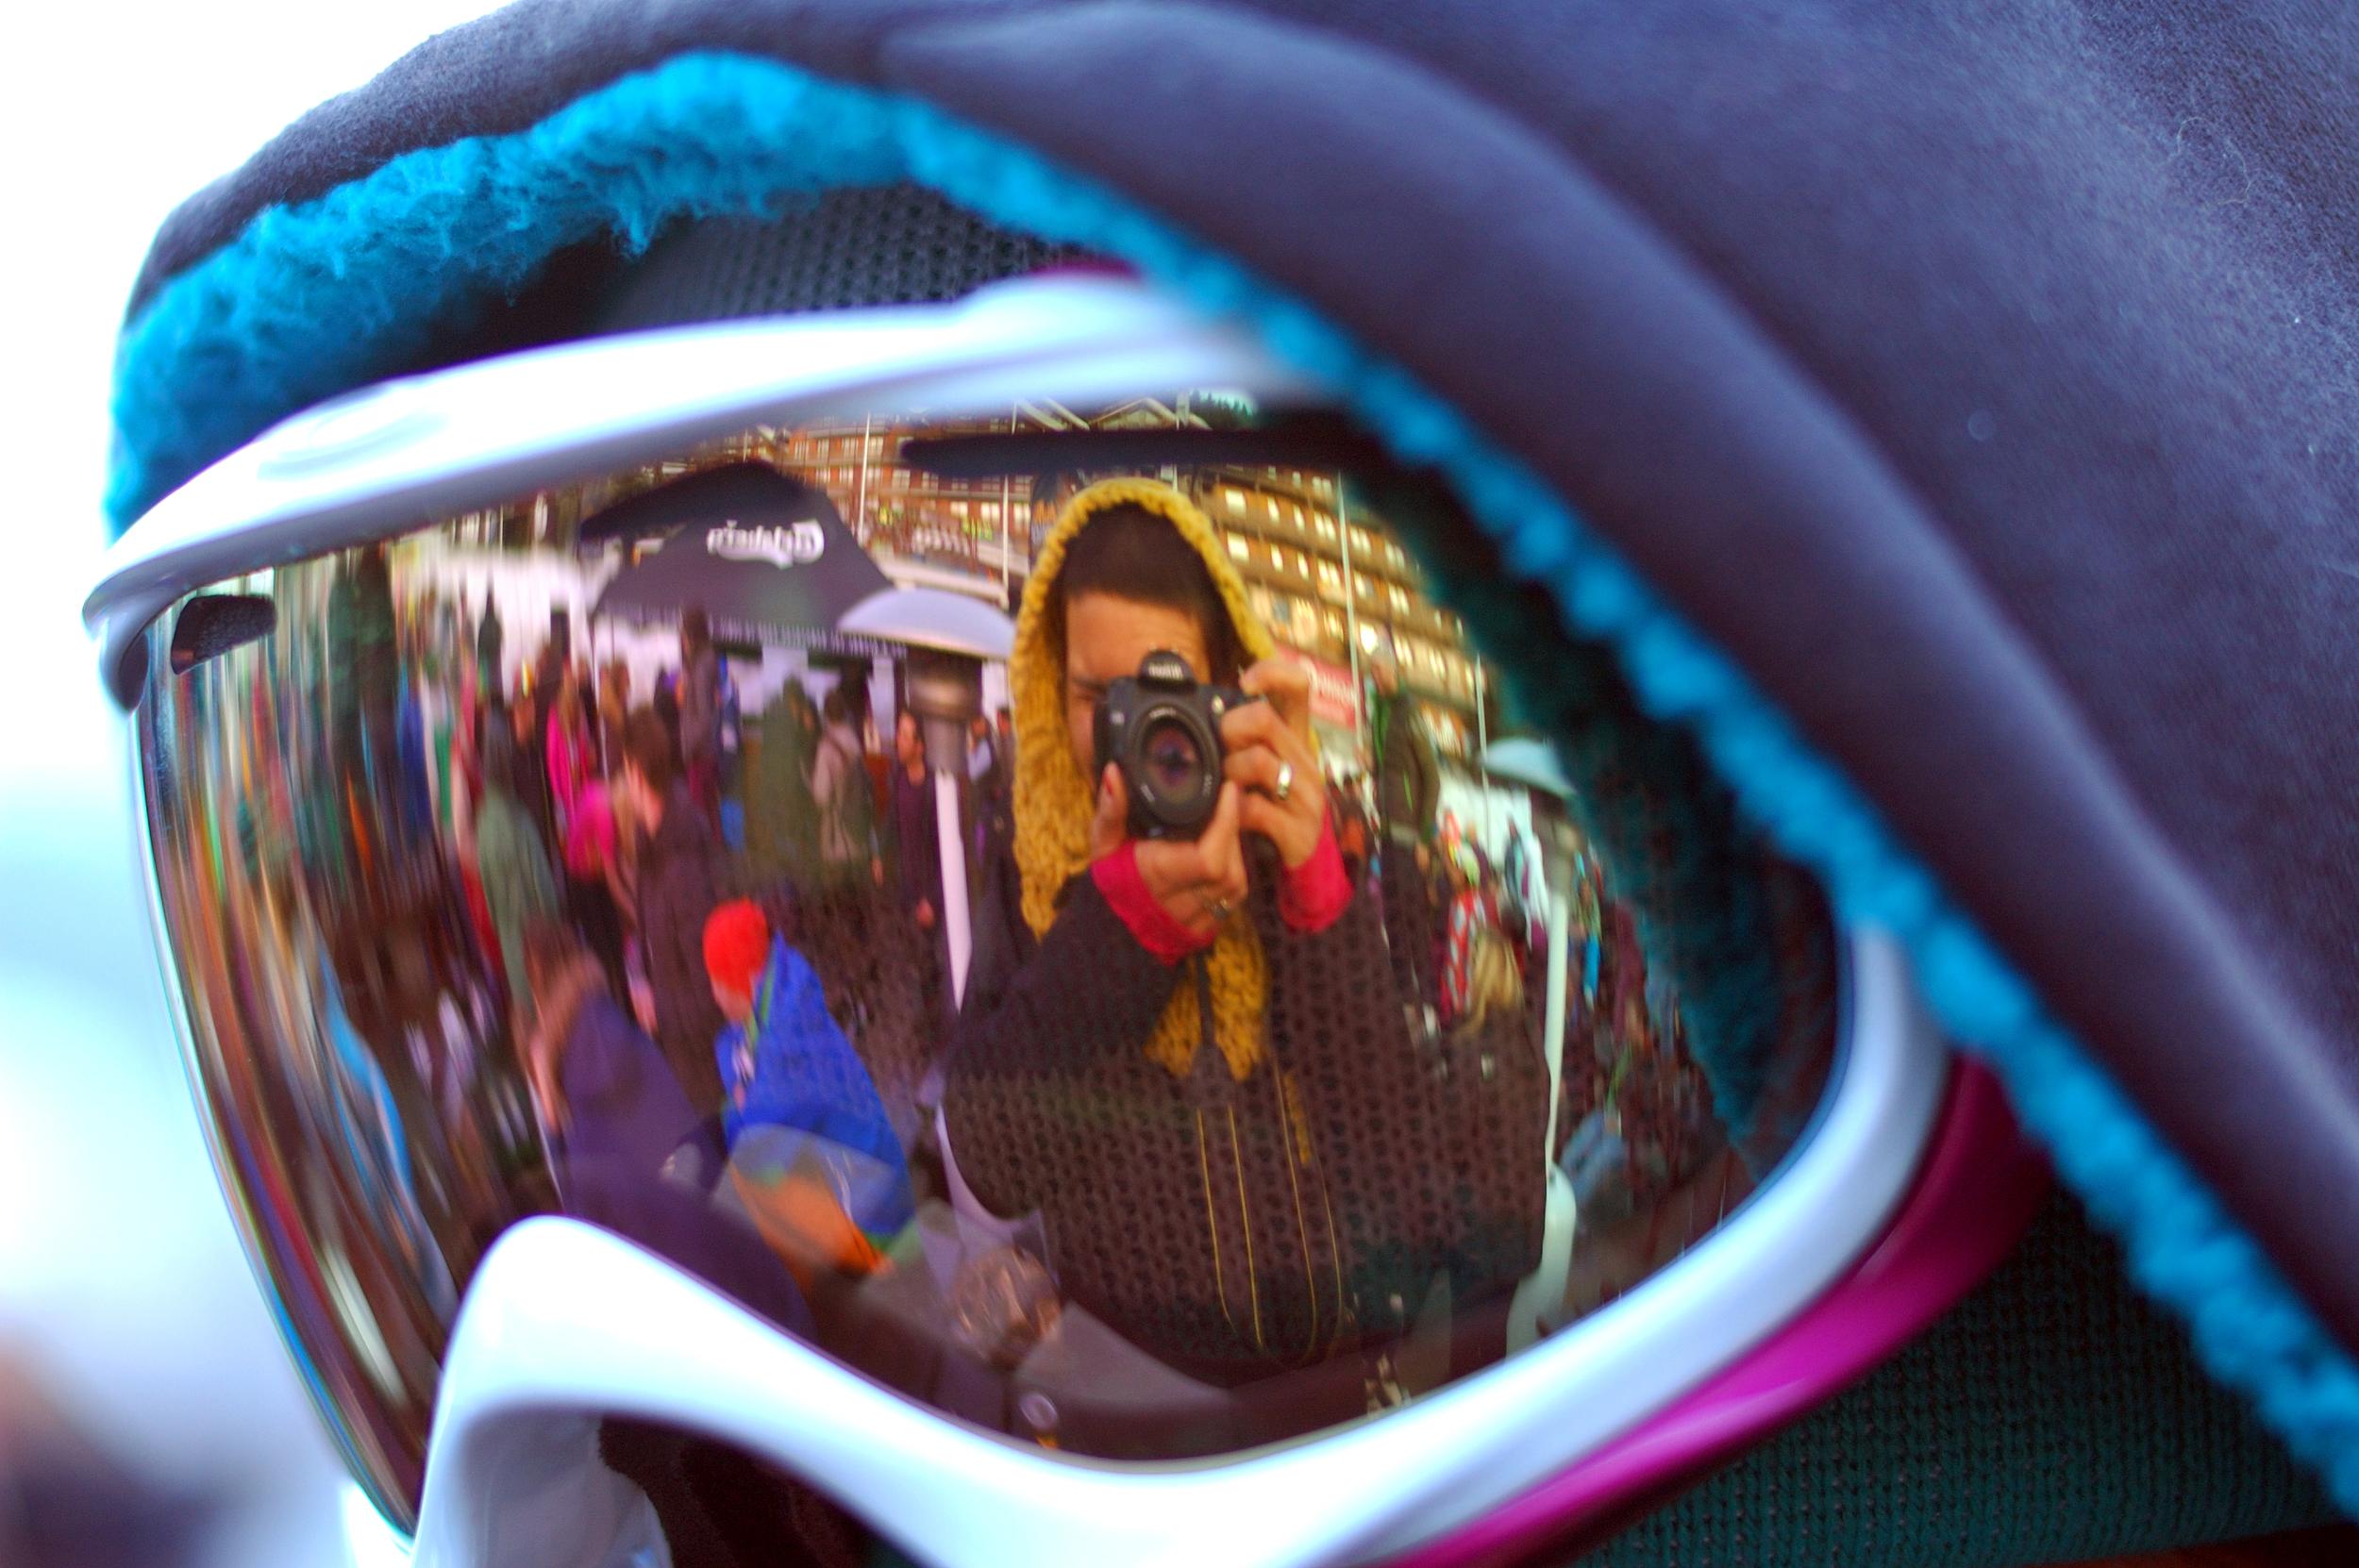 bernard goggles self-portrait.jpg